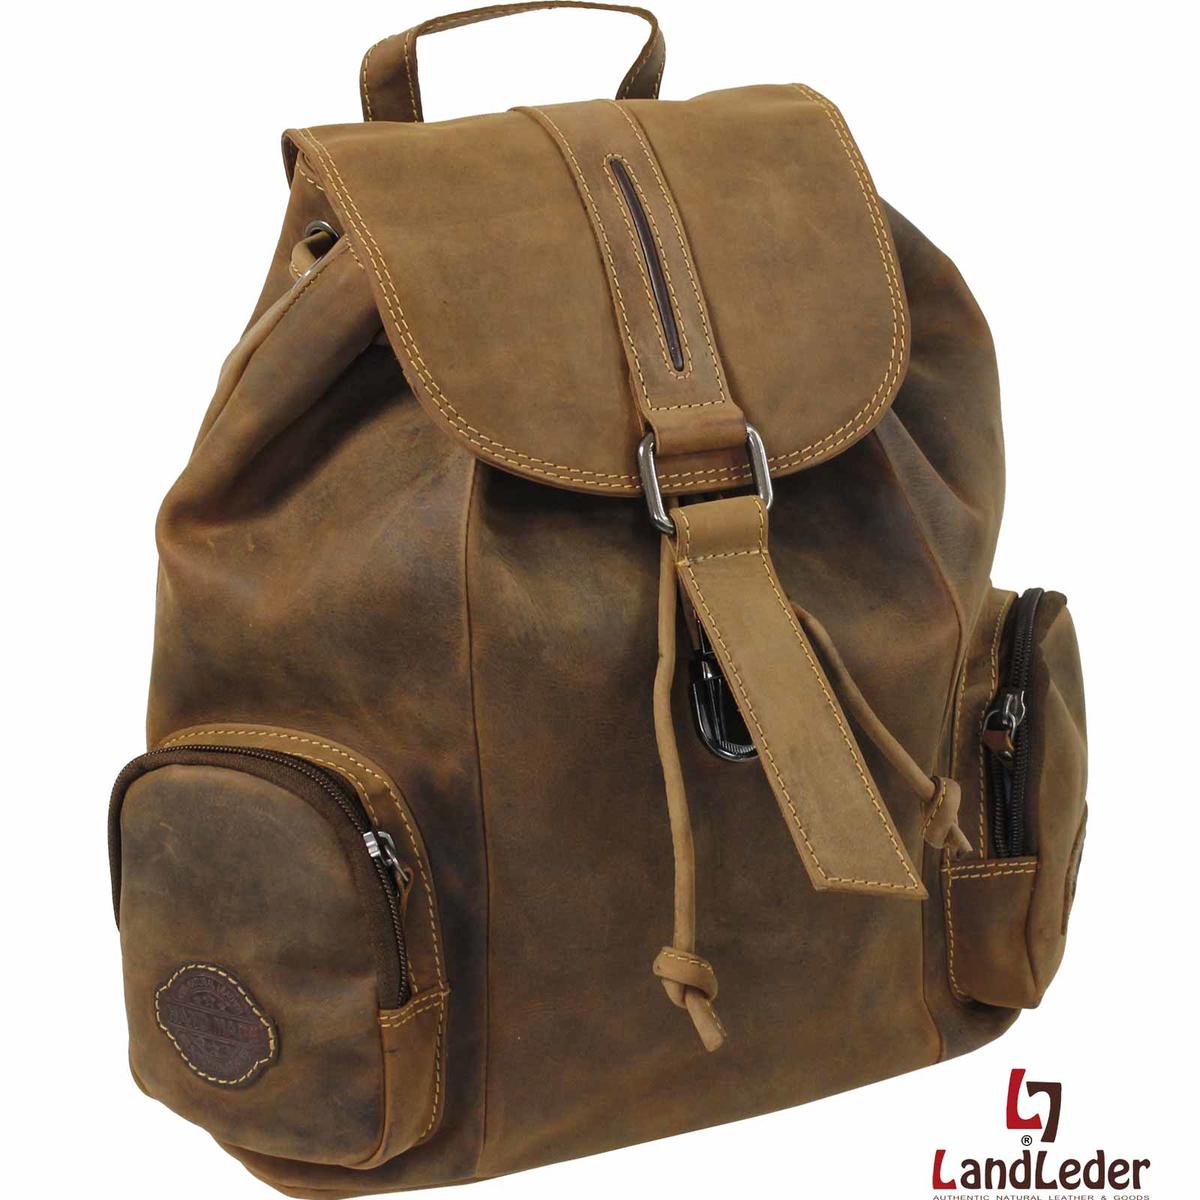 09331446cb7 LandLeder City-Rucksack Eco Rindleder, 179,80 €